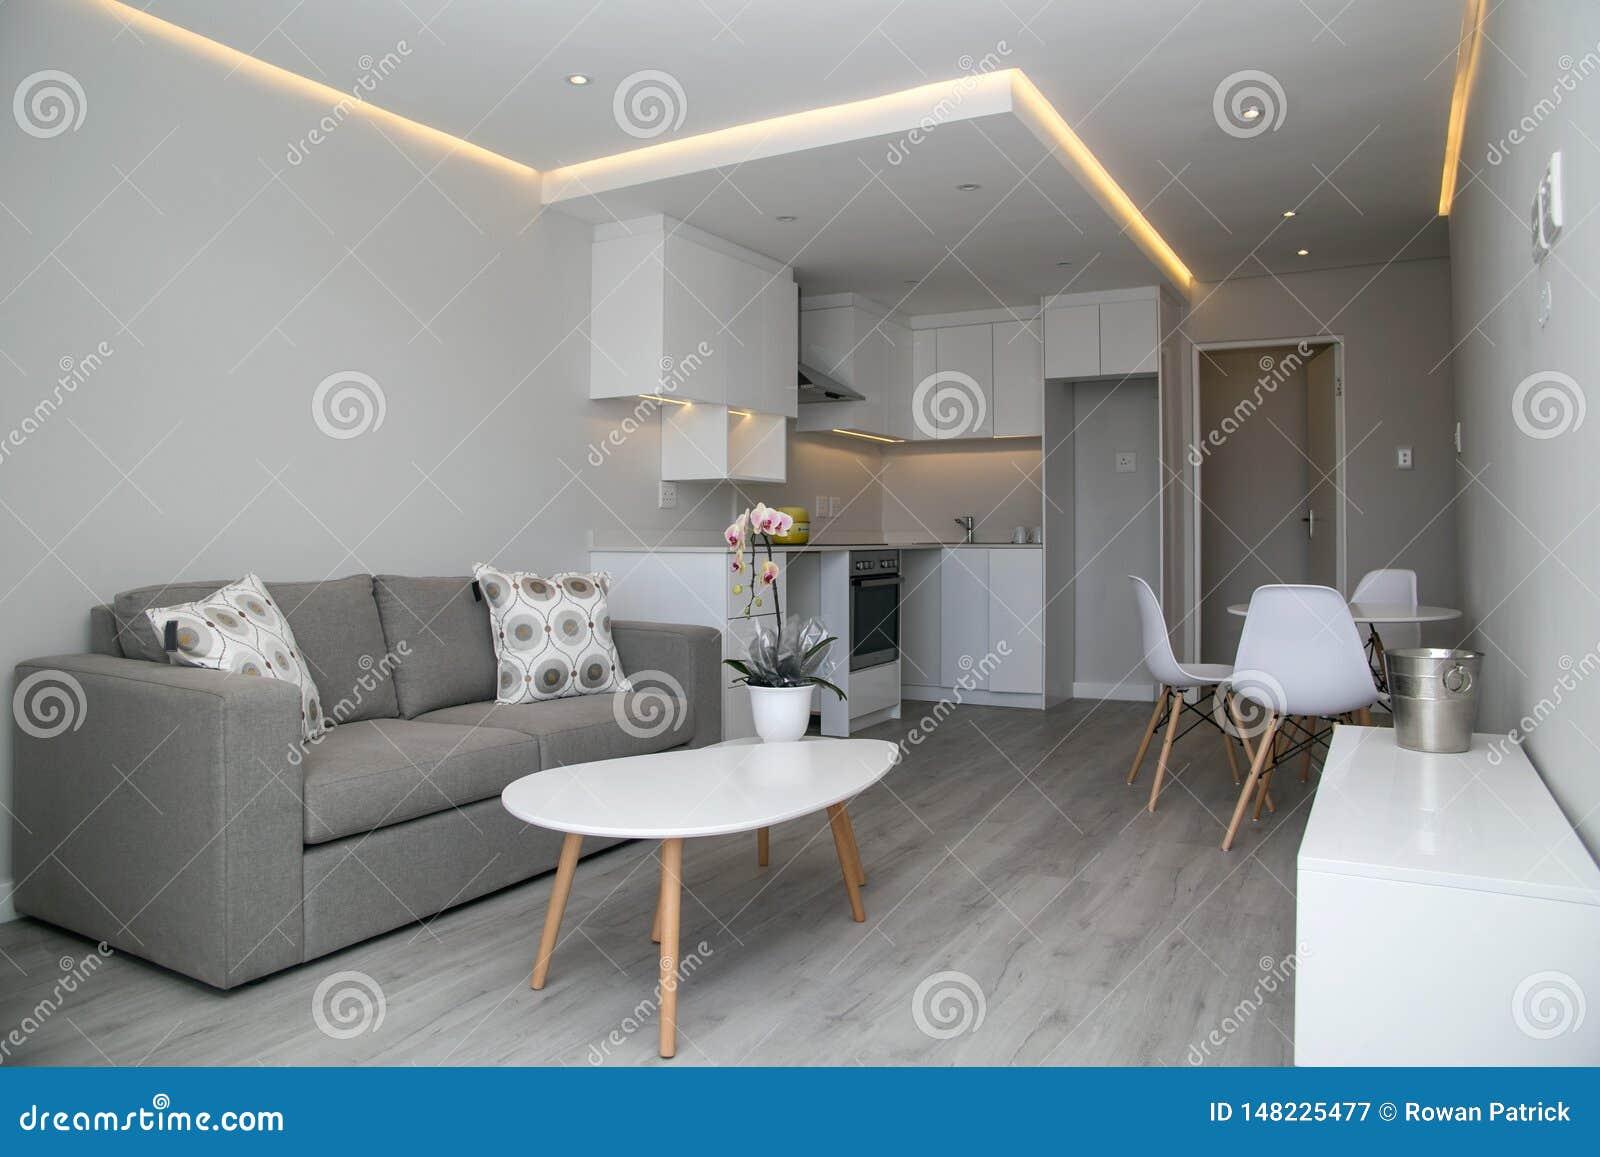 Small studio apartment stock image. Image of decor, loft ...